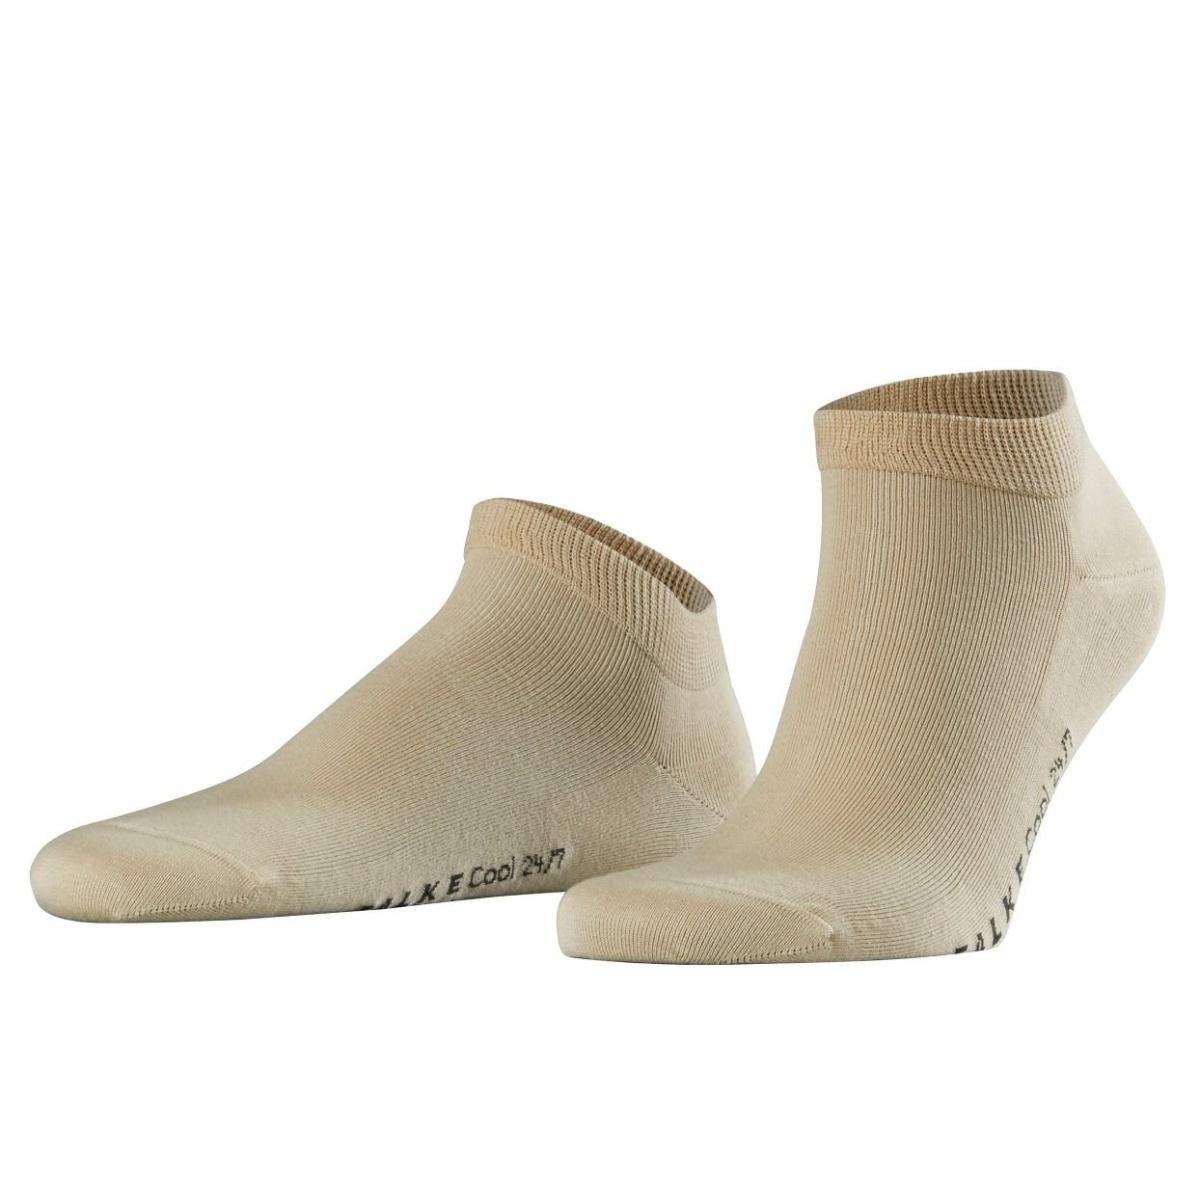 Falke Tagessocke Cool 247 Sneaker sand 1er Herren